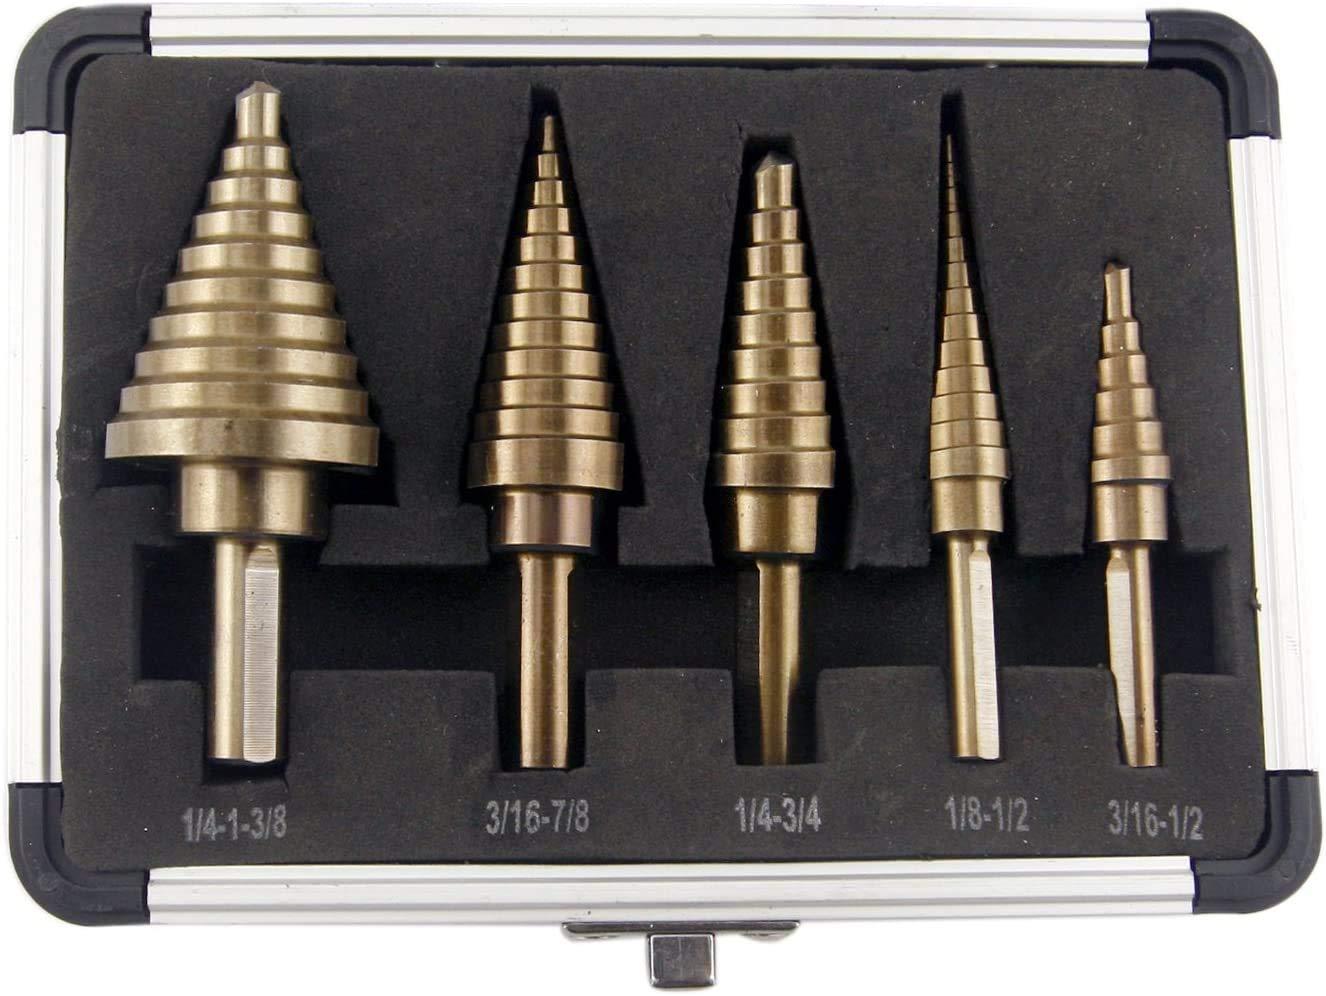 Step Drill Bit Translated Safety and trust Set PANGOLIN High Speed HSS Steel D 5-Piece